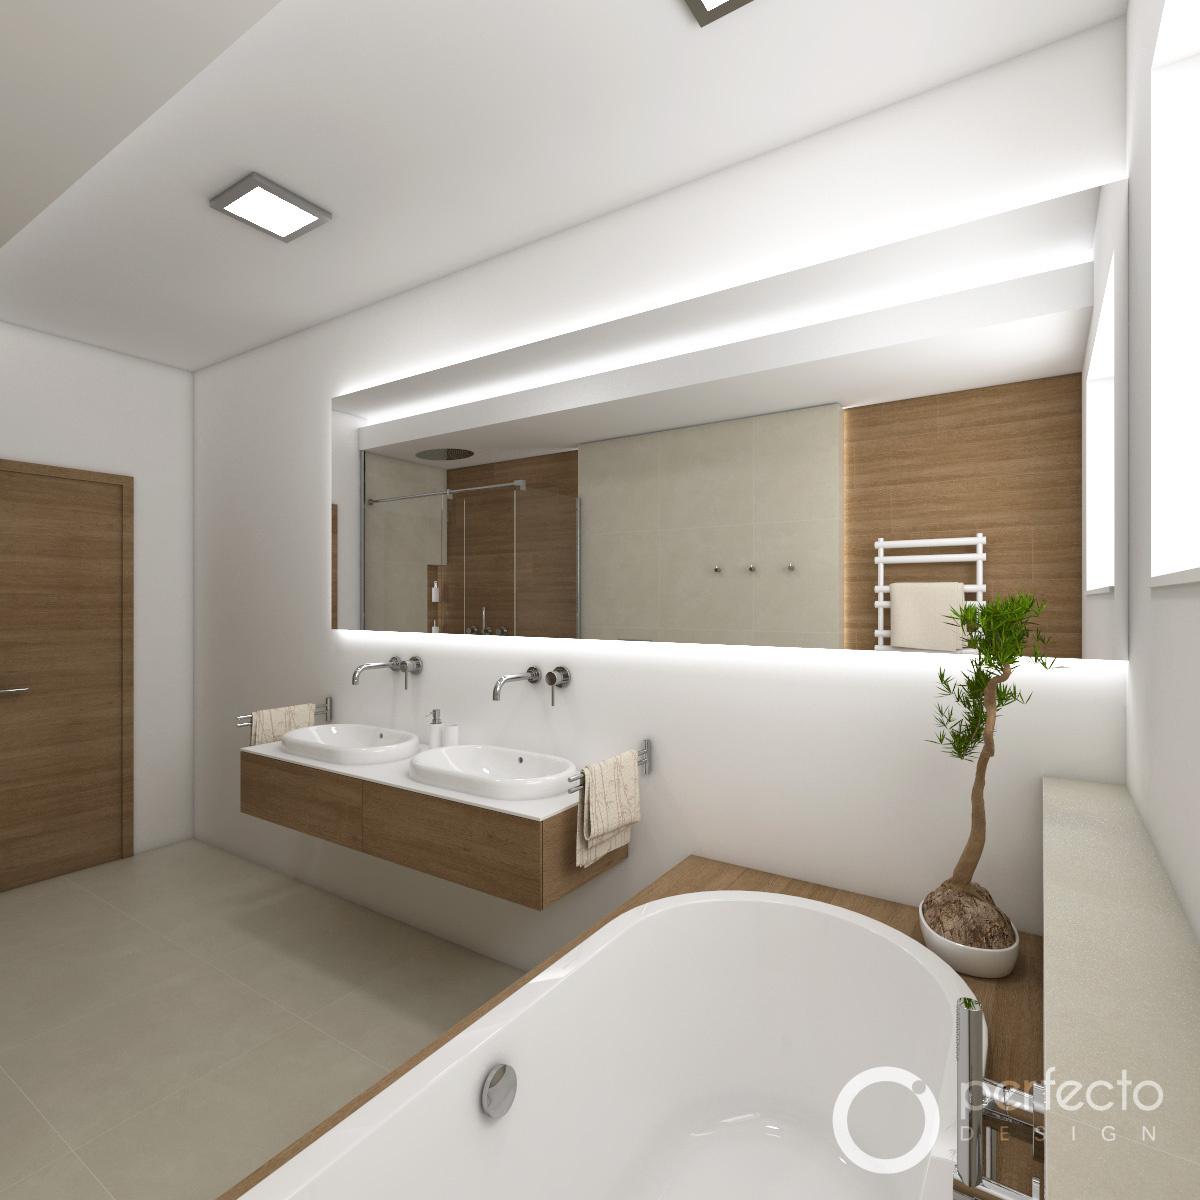 natur-badezimmer teak | perfecto design, Badezimmer